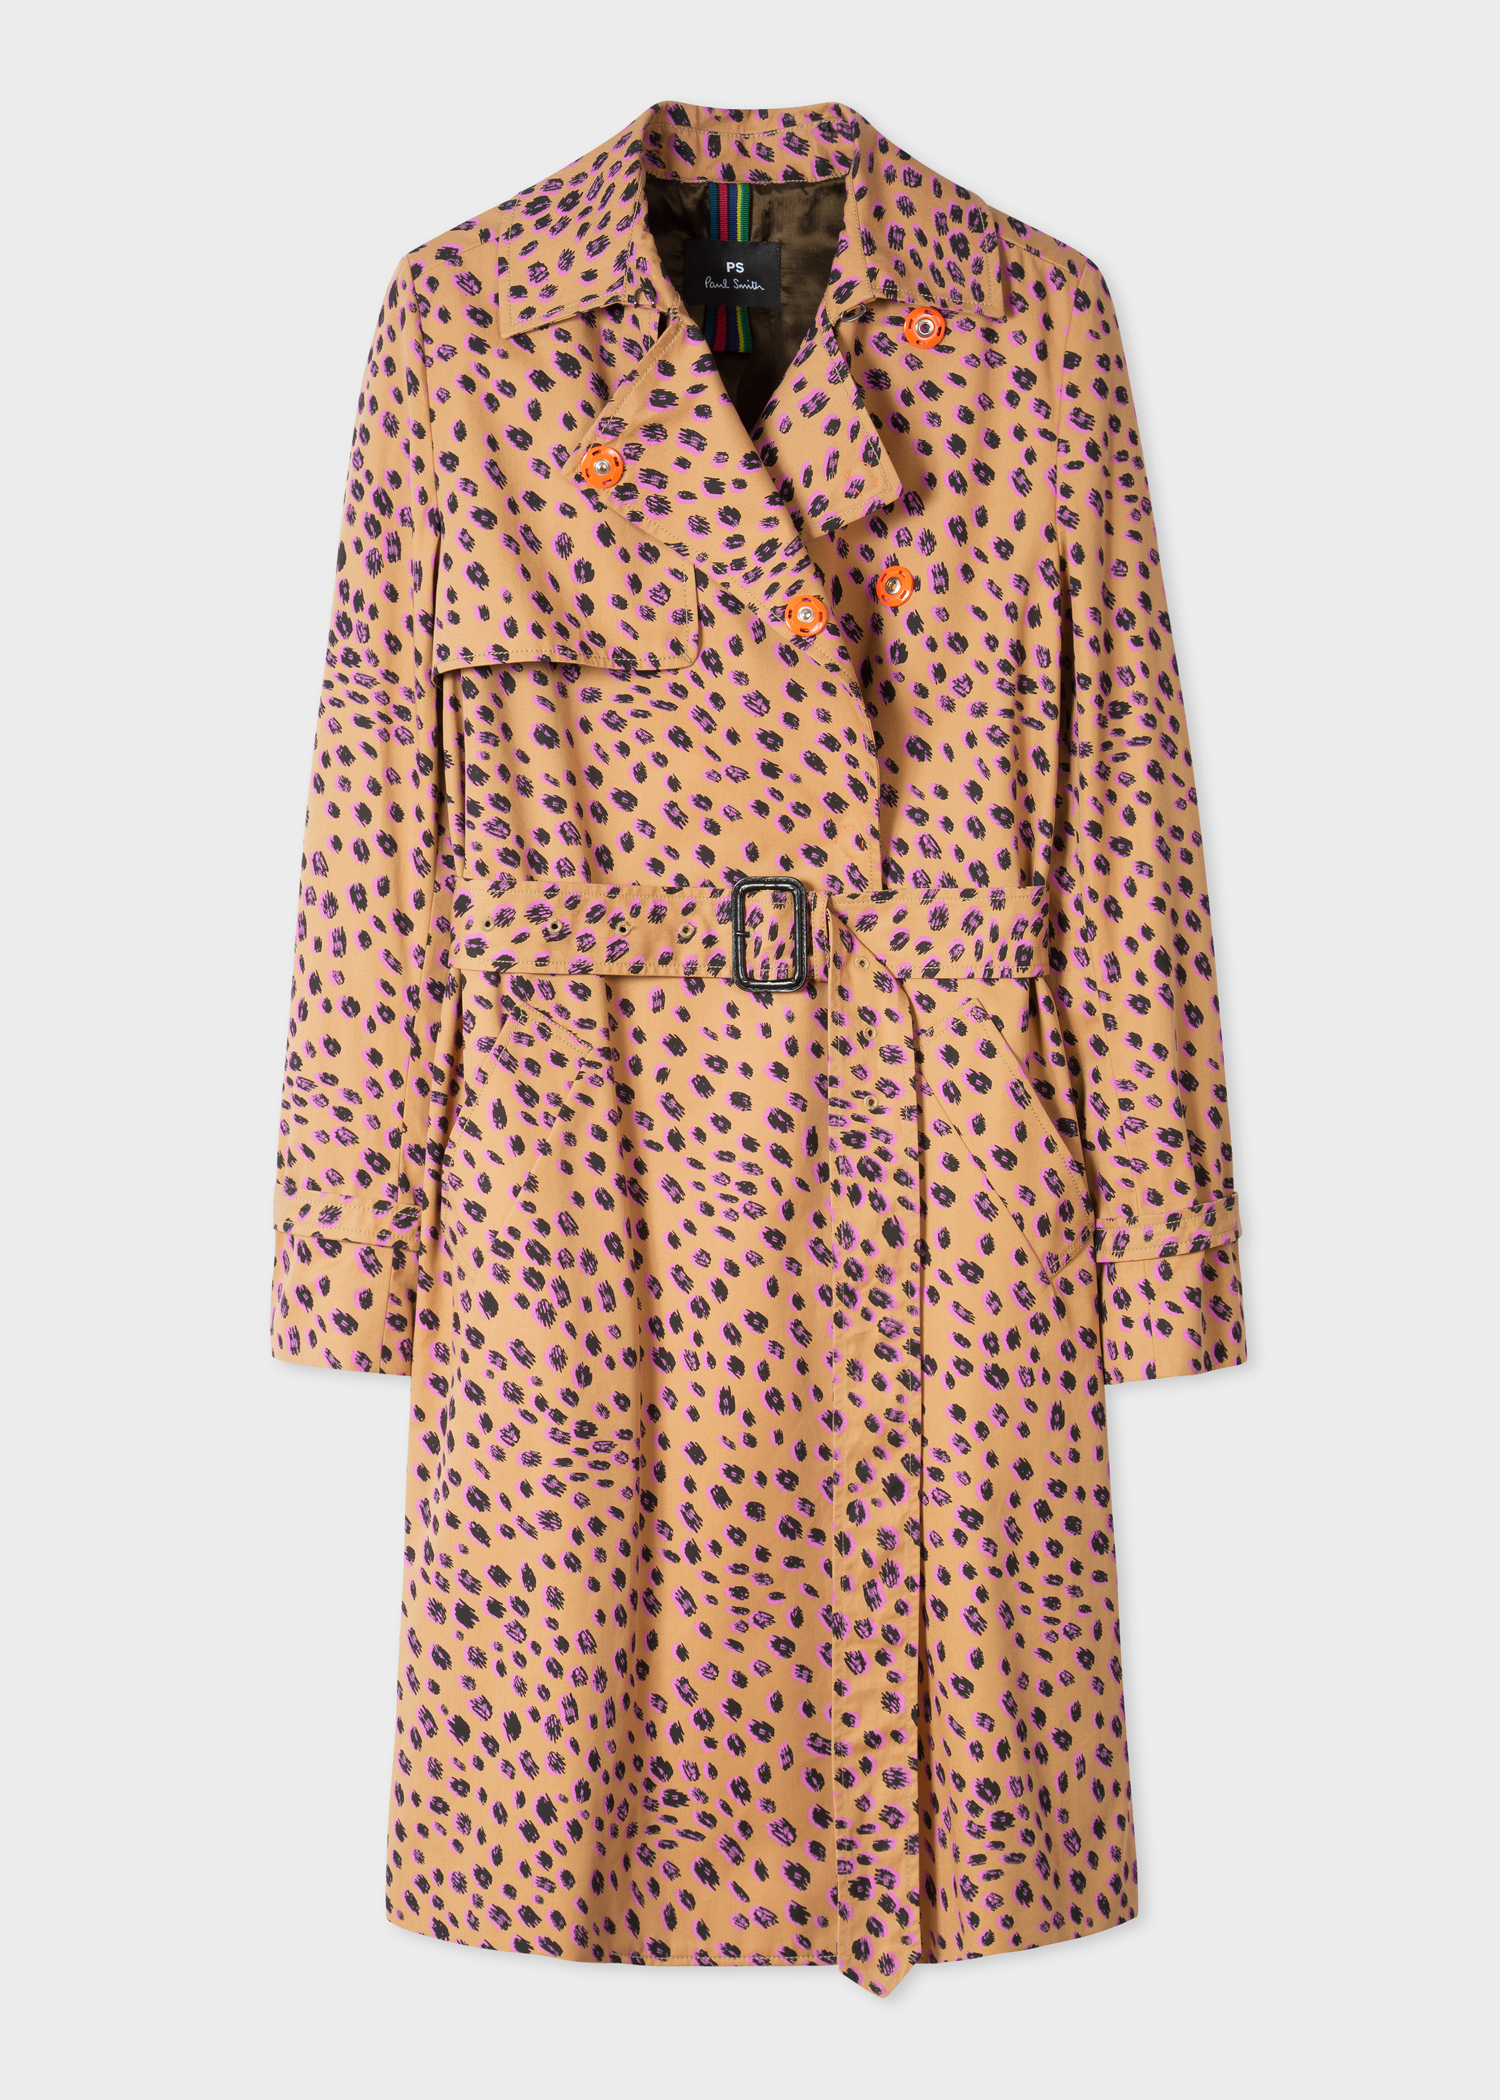 69b631f46 Front view - Women s Tan  Cheetah  Print Cotton Mac Paul Smith